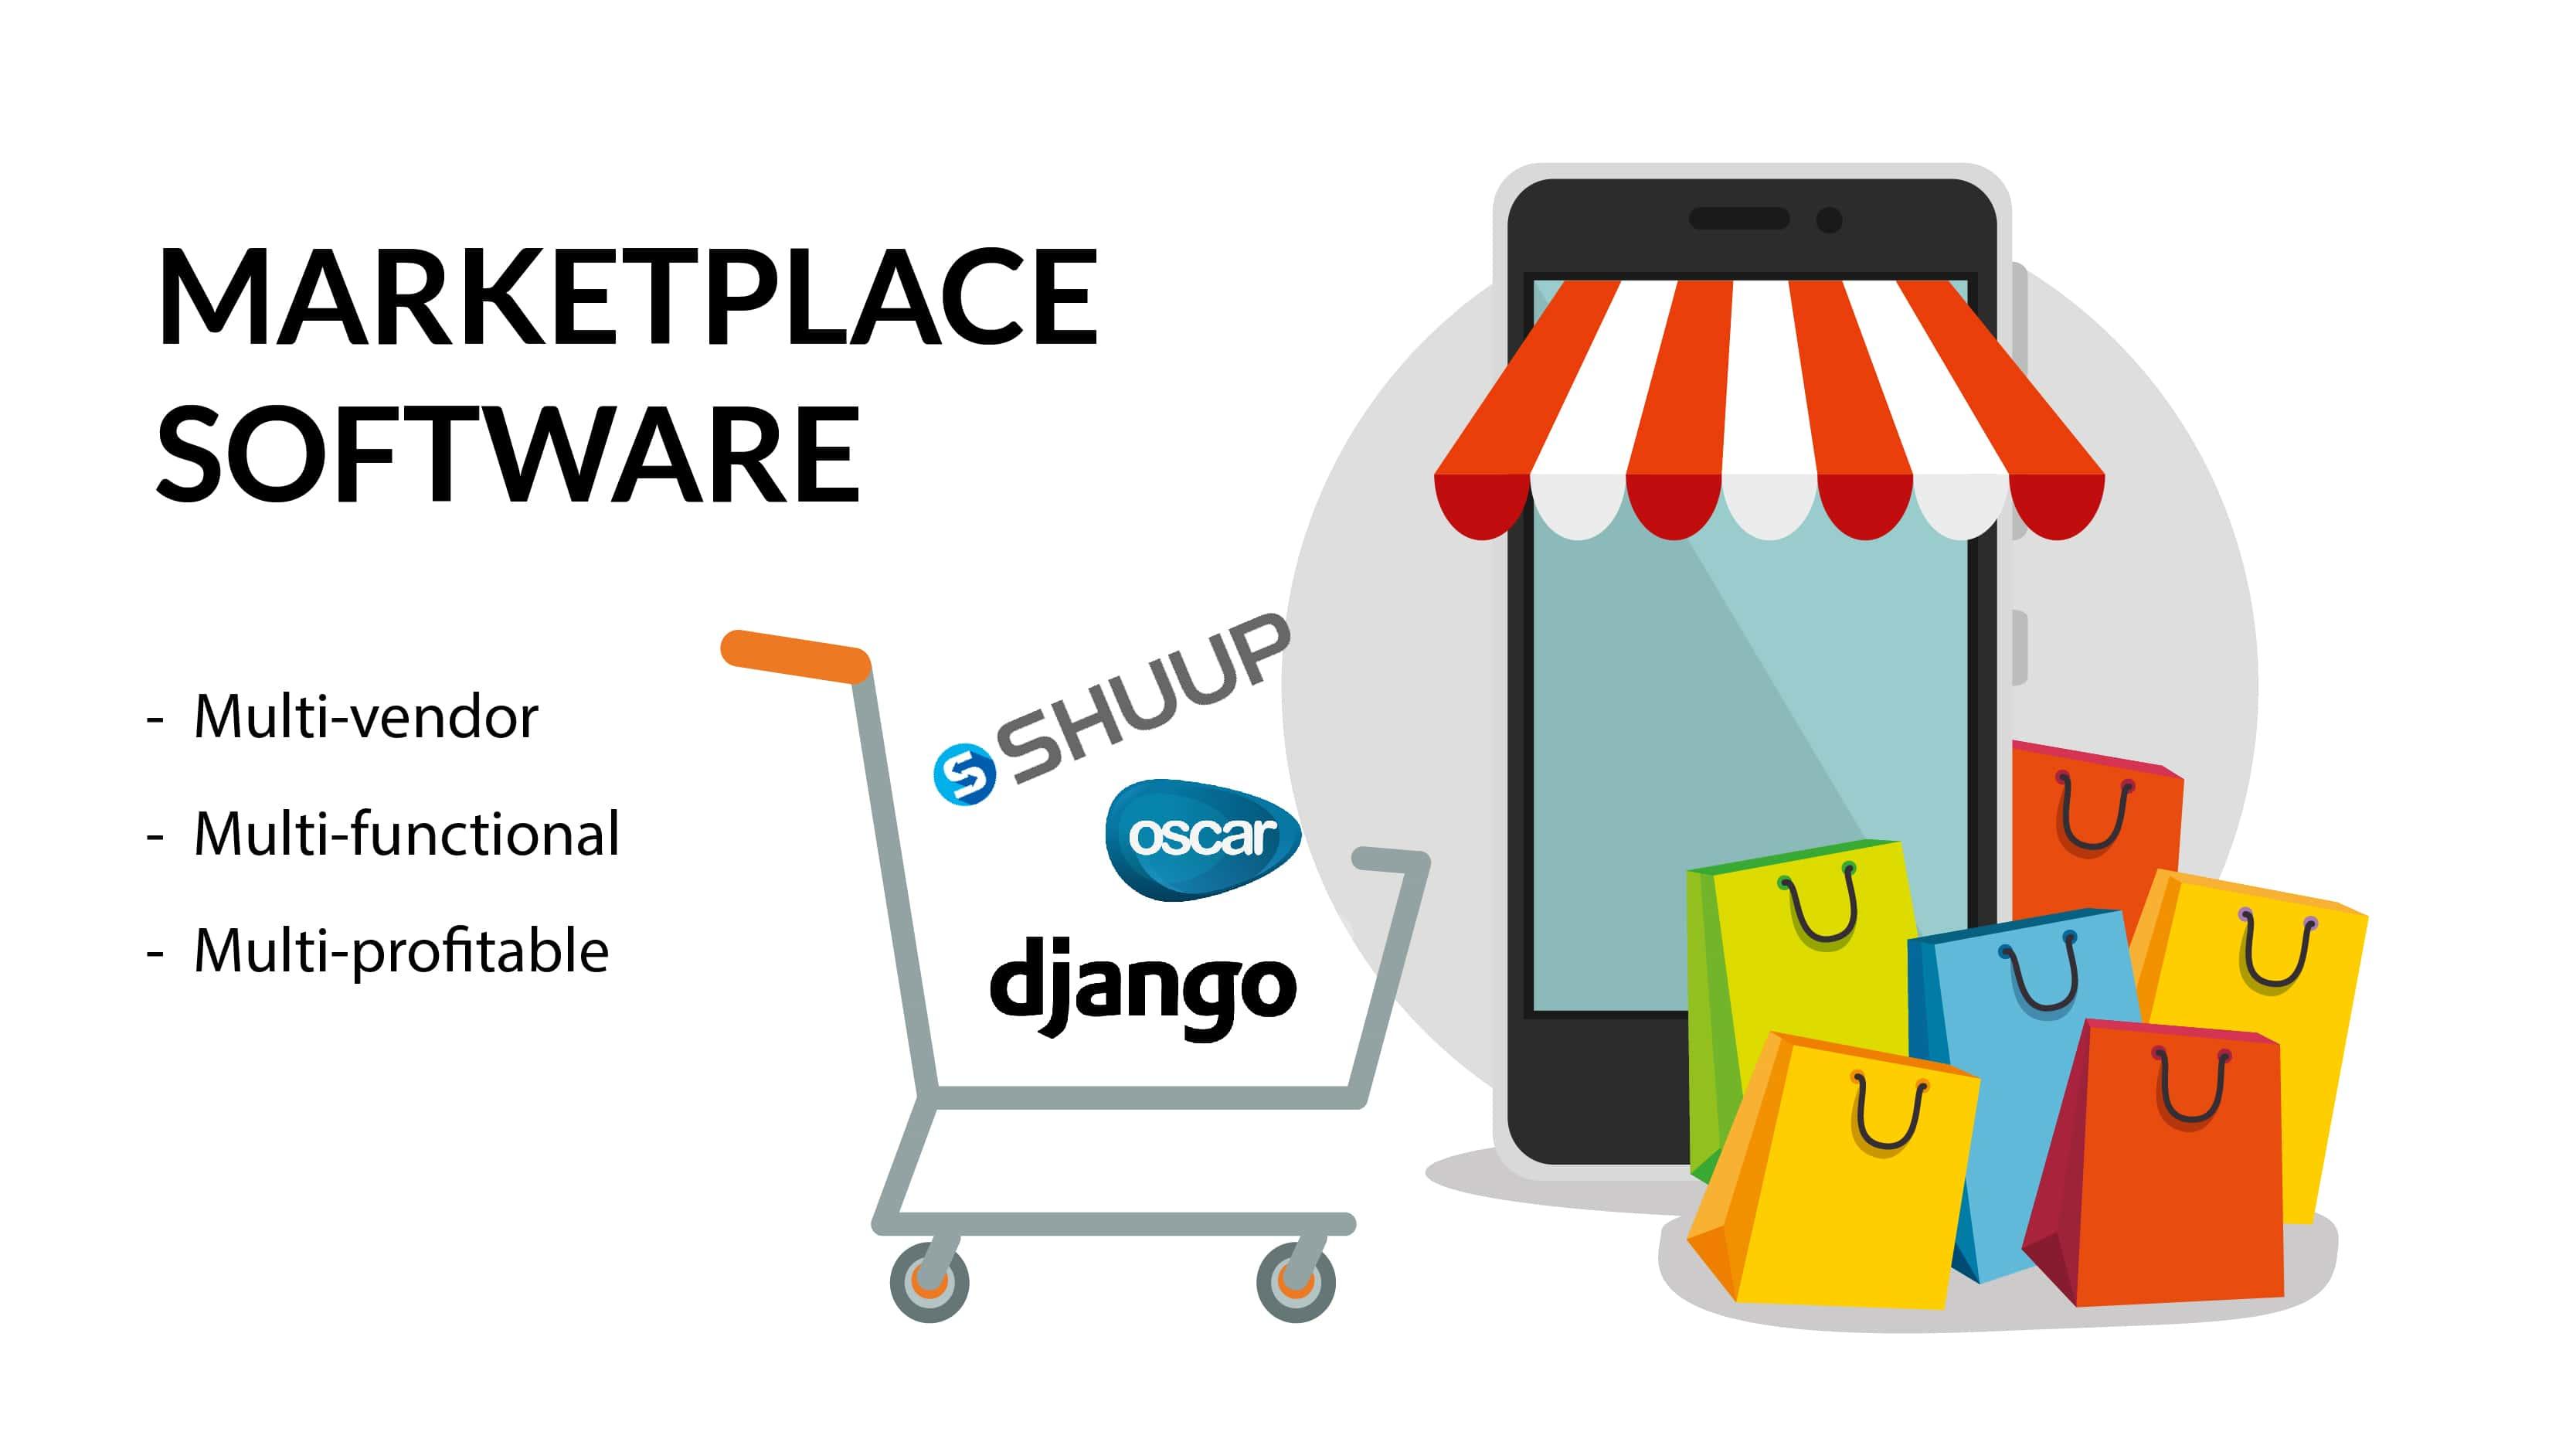 Marketplace software. Multi-vendor. Multi-functional. Multi-profitable.